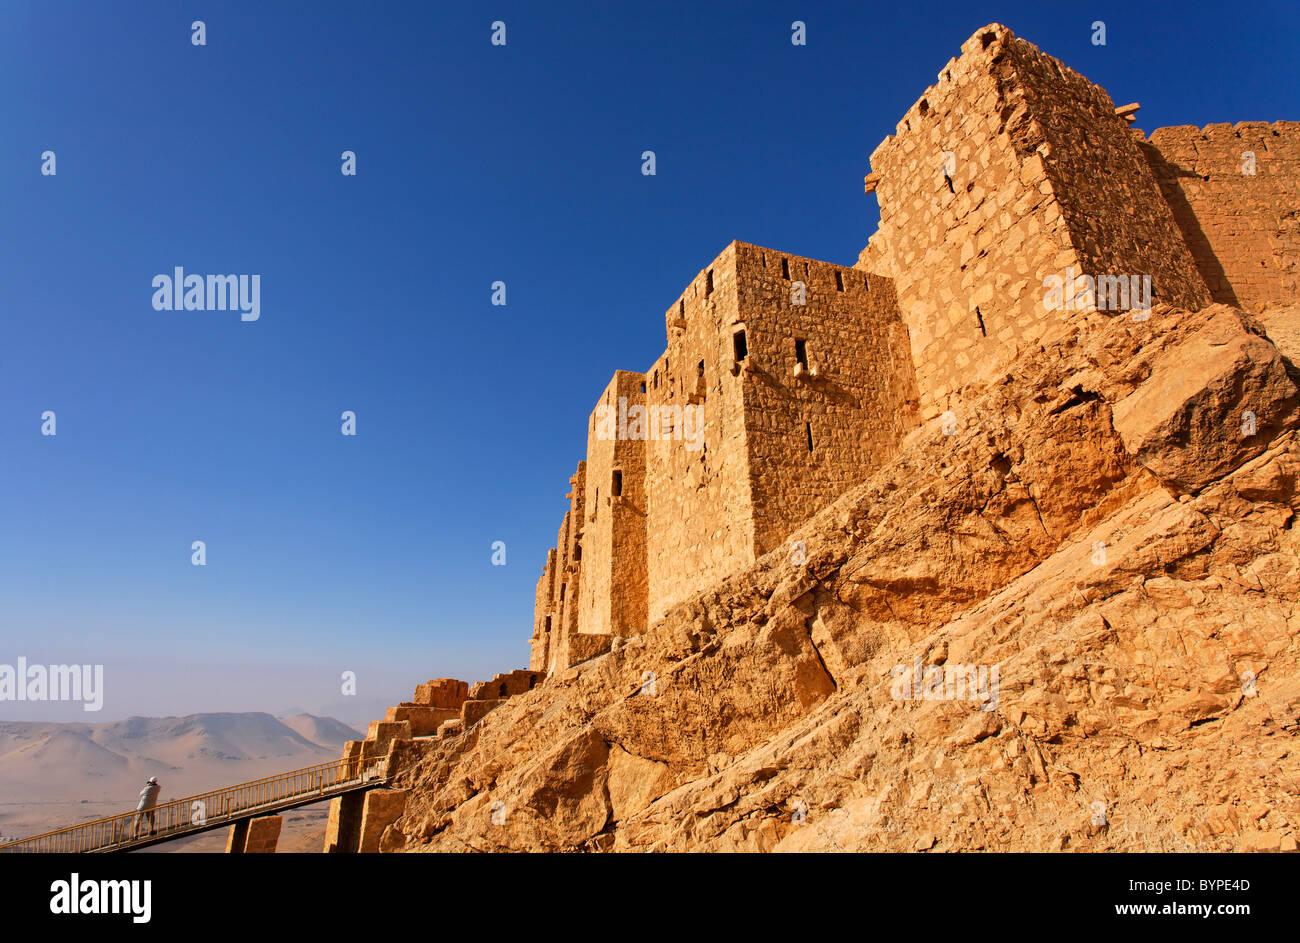 Qalaat Ibn Maan, the Arab Castle, at Palmyra, Syria - Stock Image